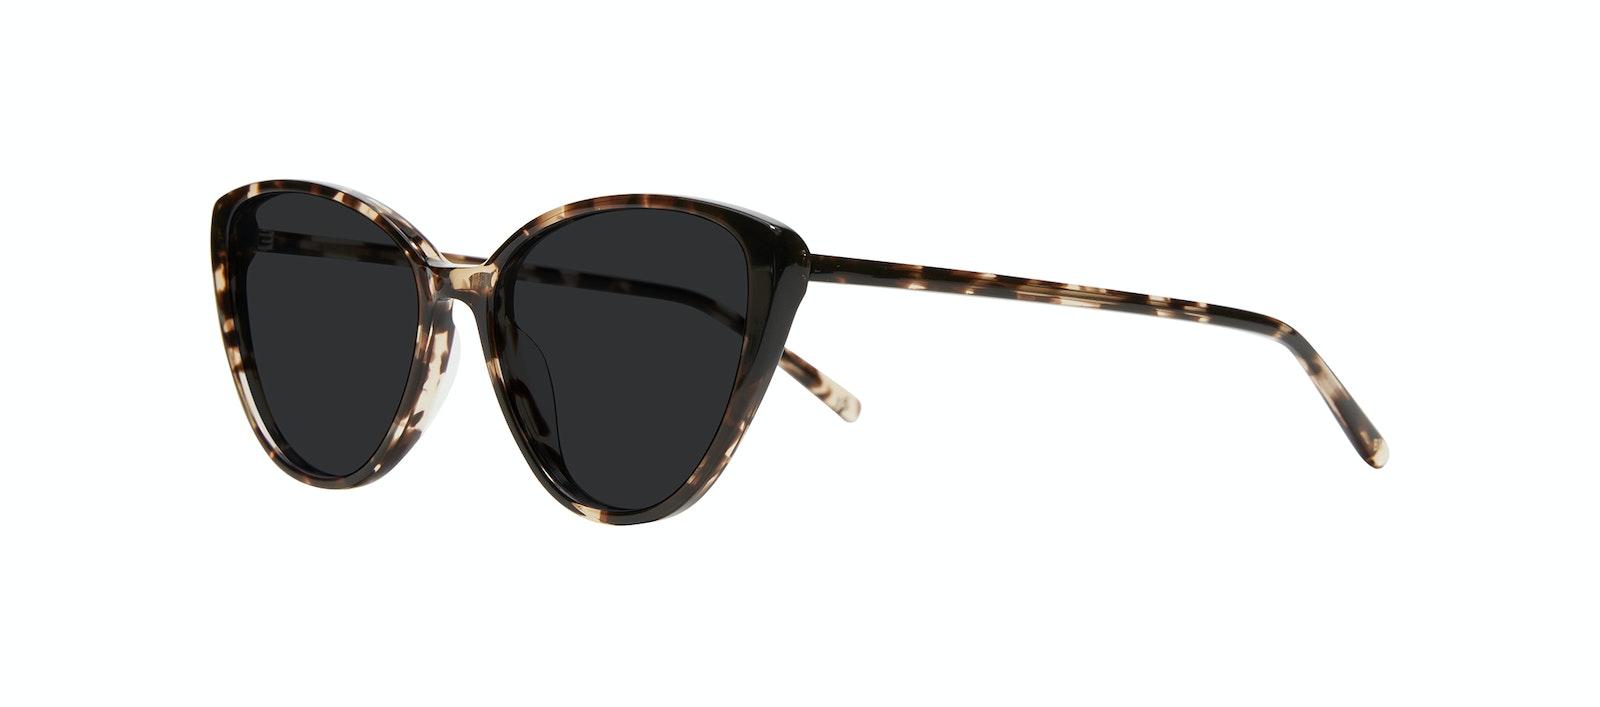 Affordable Fashion Glasses Cat Eye Sunglasses Women Poise XS Leopard Tilt